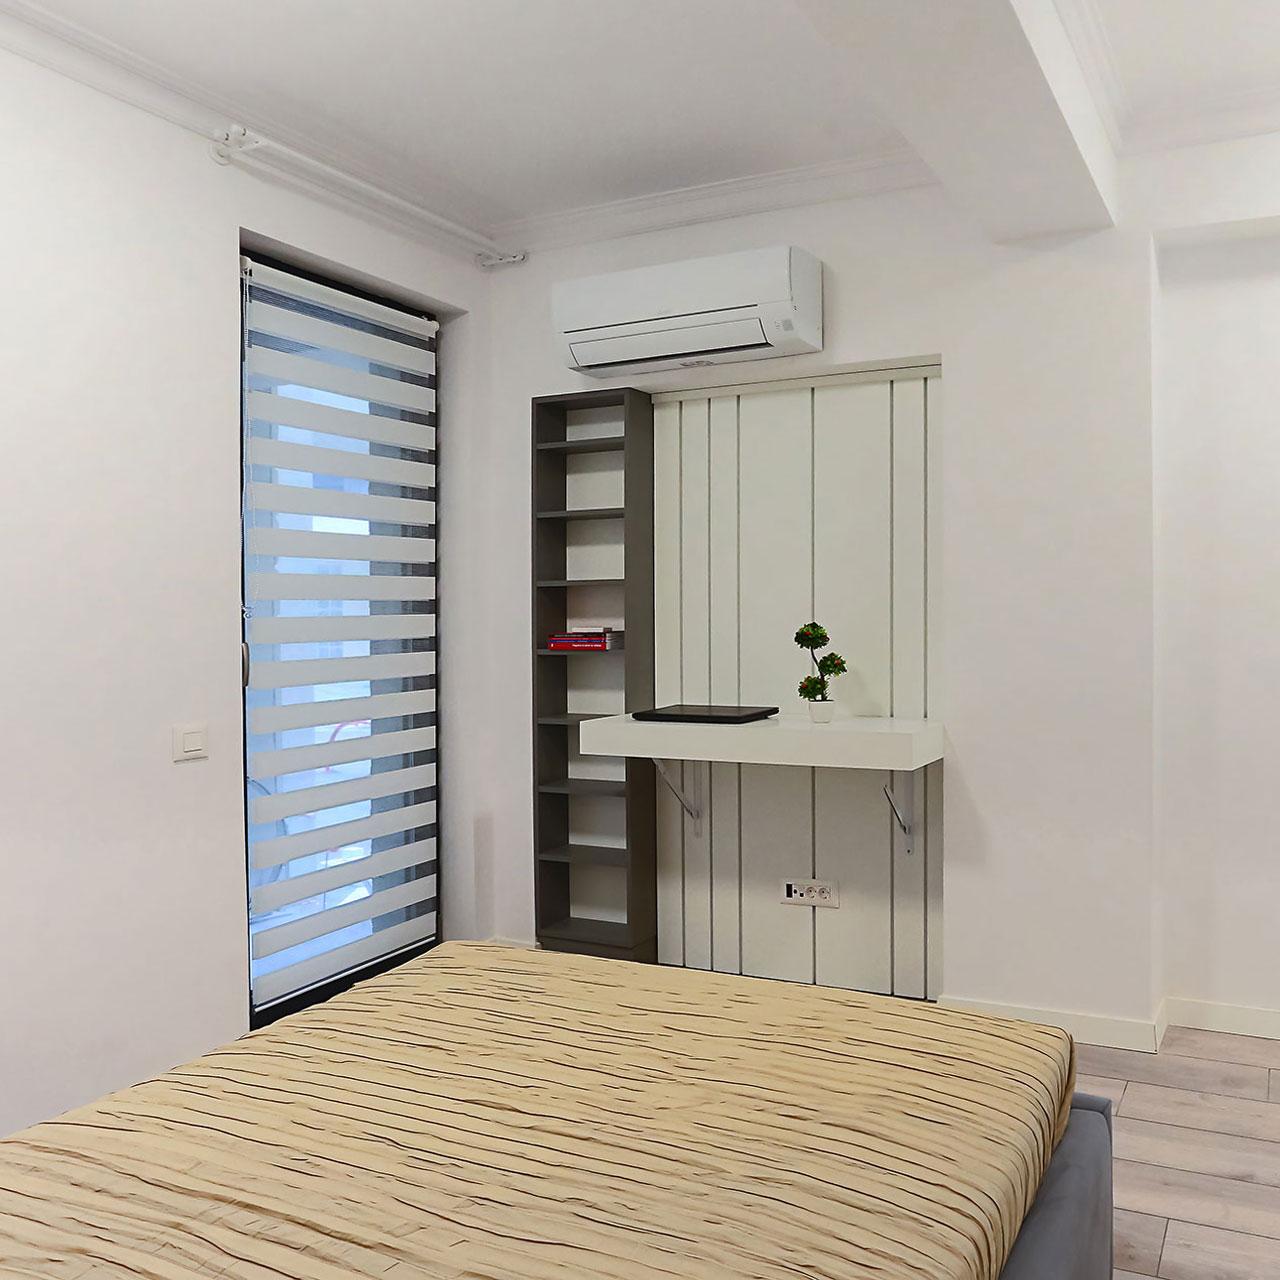 Apartamente de vanzare Bucuresti - Catedral Residence - Marriott, Piata Unirii, 13 Septembrie, Izvor - G4 - 4